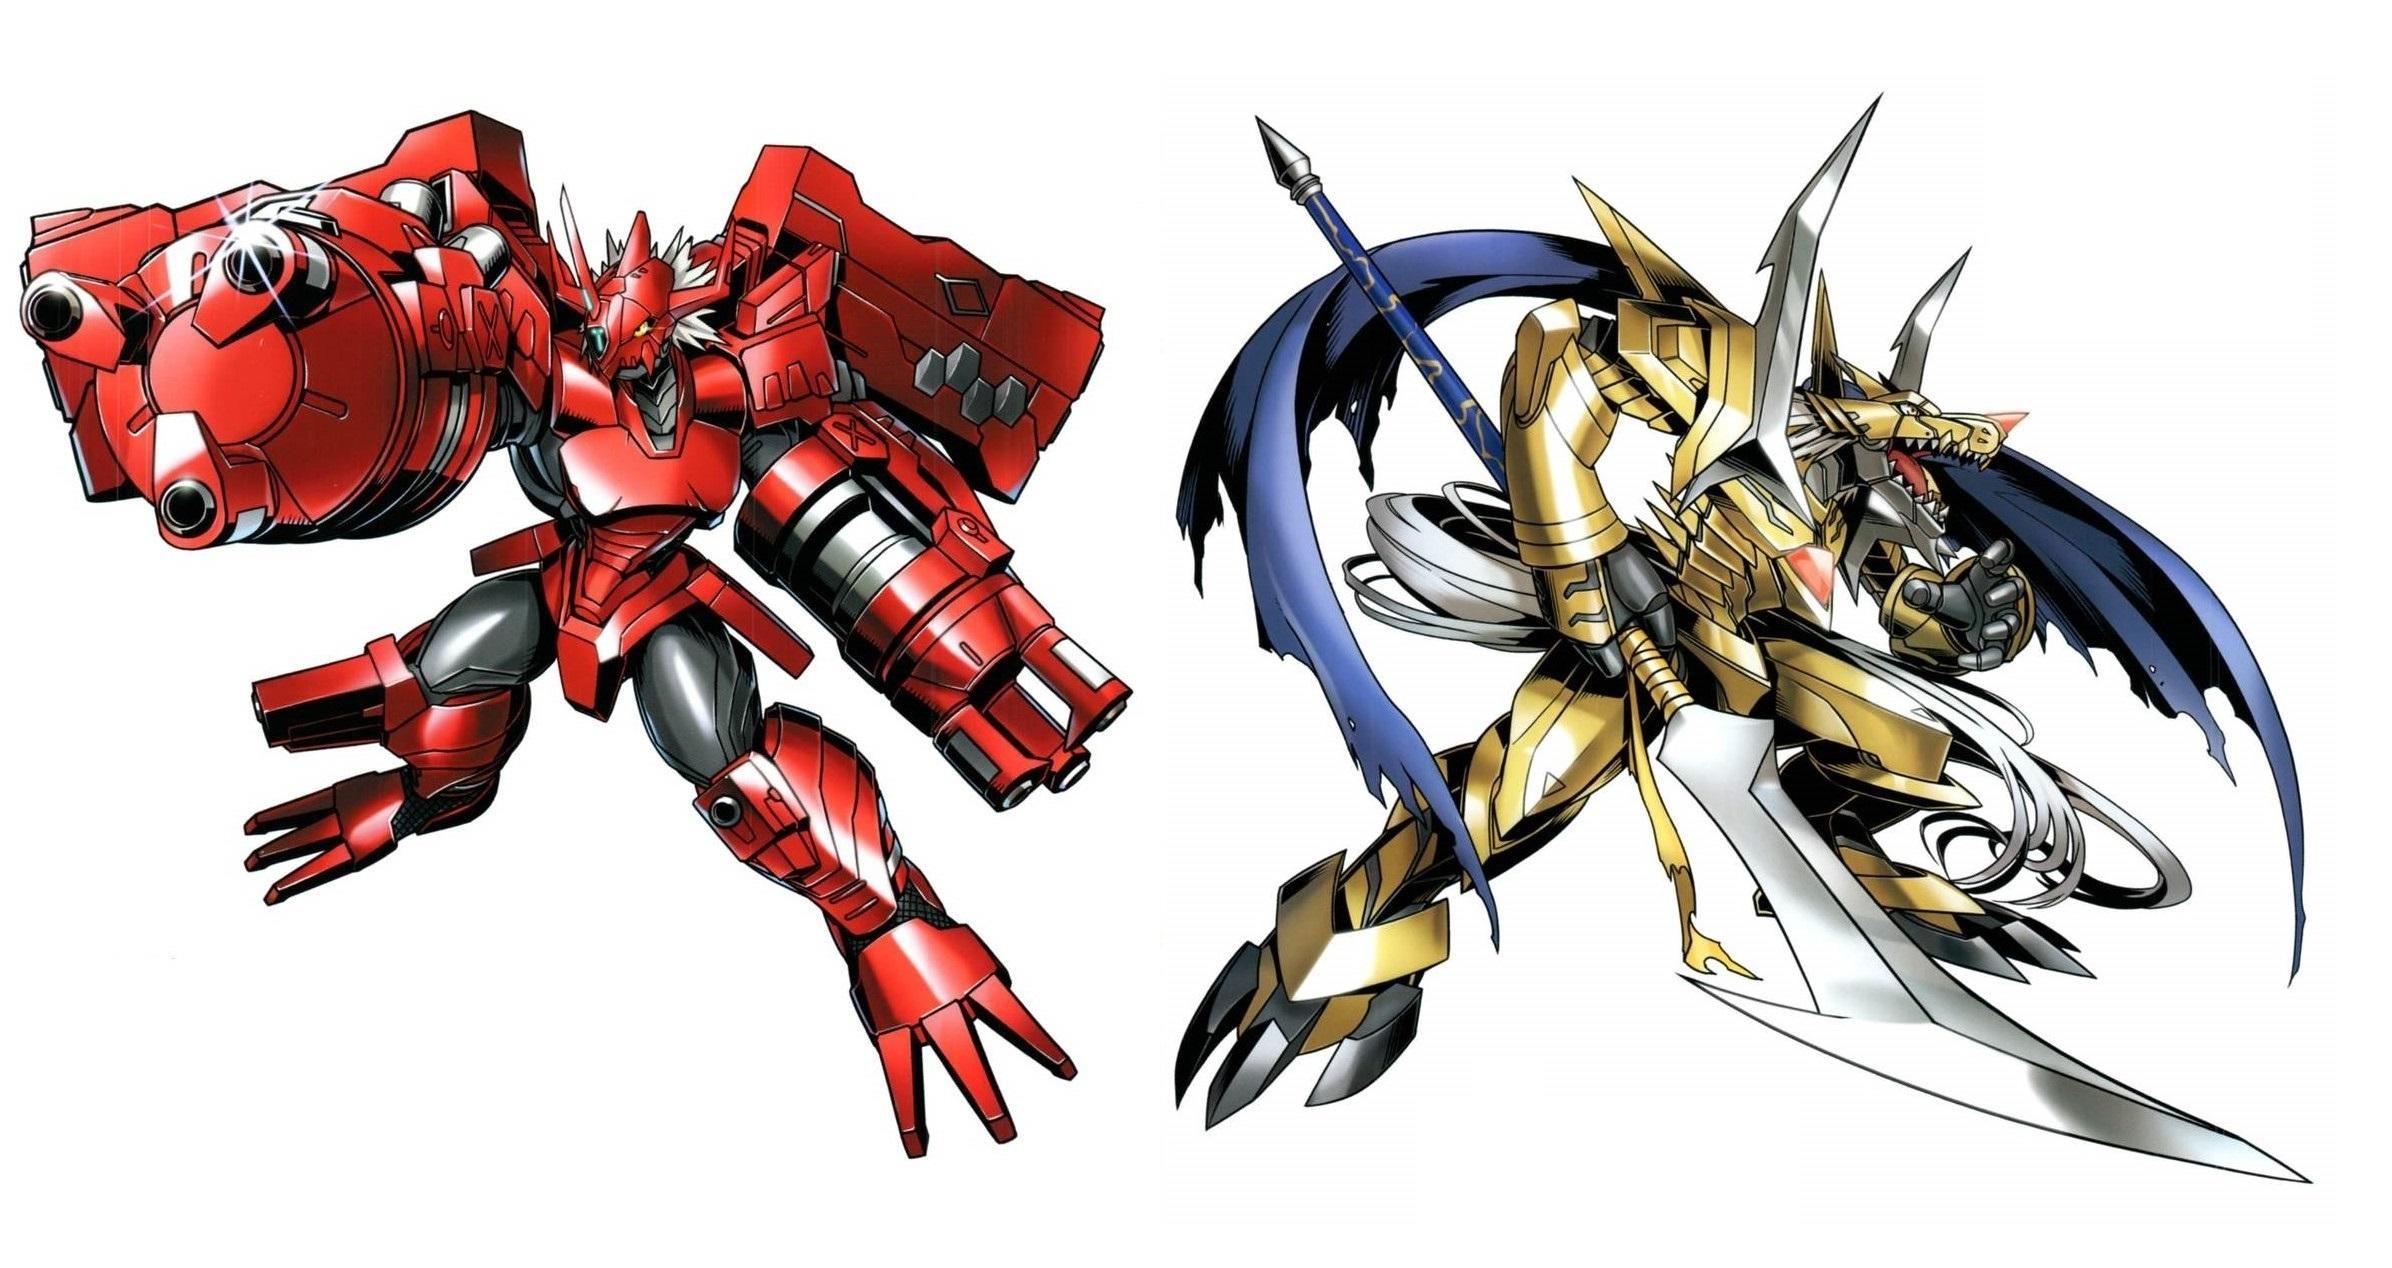 Blitzgreymon And Cressgarurumon Digimon Digimon Digimon Digital Monsters Digimon Wallpaper